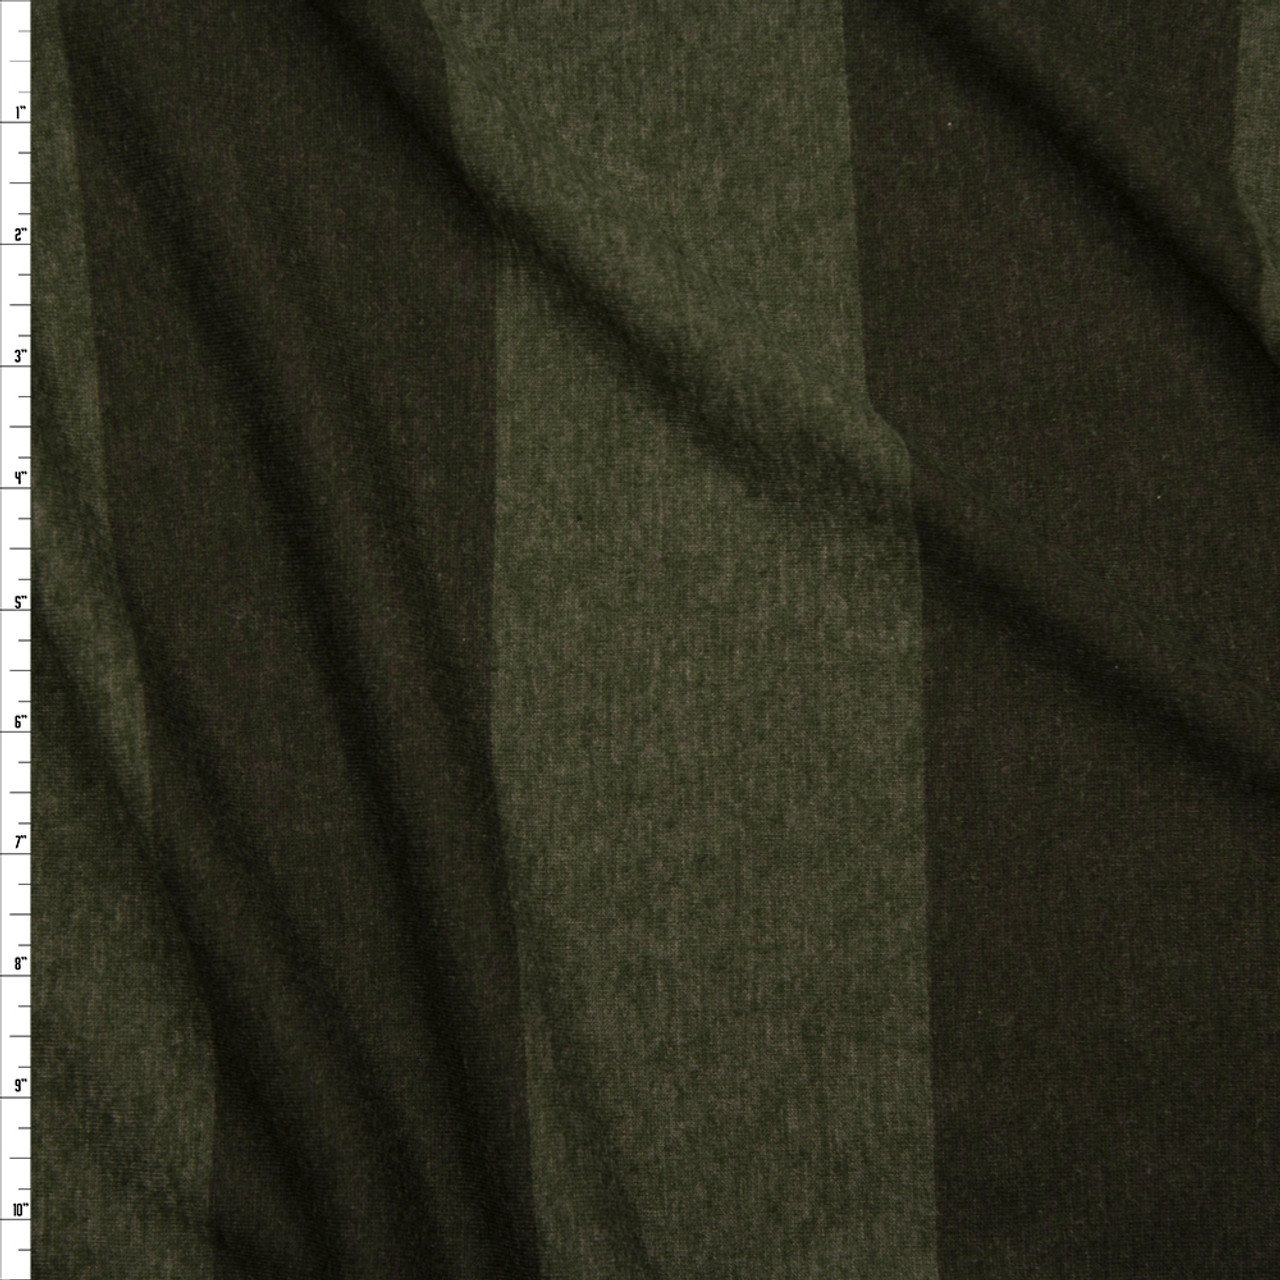 b922f6b1a3a Cali Fabrics Olive Wide Stripe Lightweight Jersey Knit Fabric by the ...